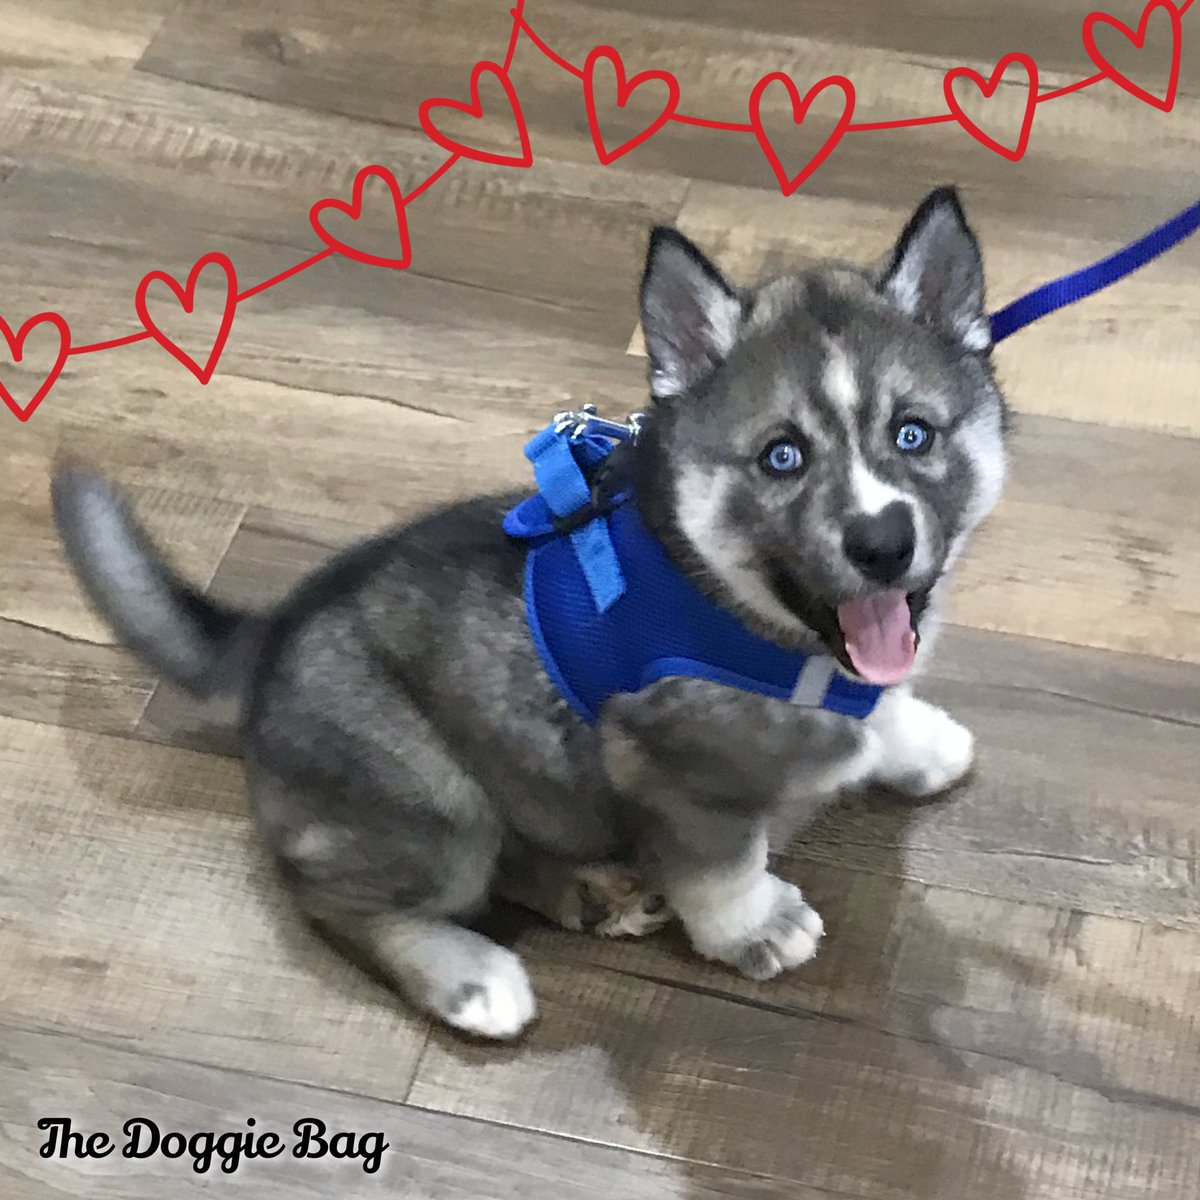 This Guy!!🤗 We just can't get enough of Loki!😍  #husky #huskypuppy #huskylife #huskylove #thatface #puppylove #thedoggiebag #petboutique #dogsoflakeland #dogmomsoflkld #lakelandflorida